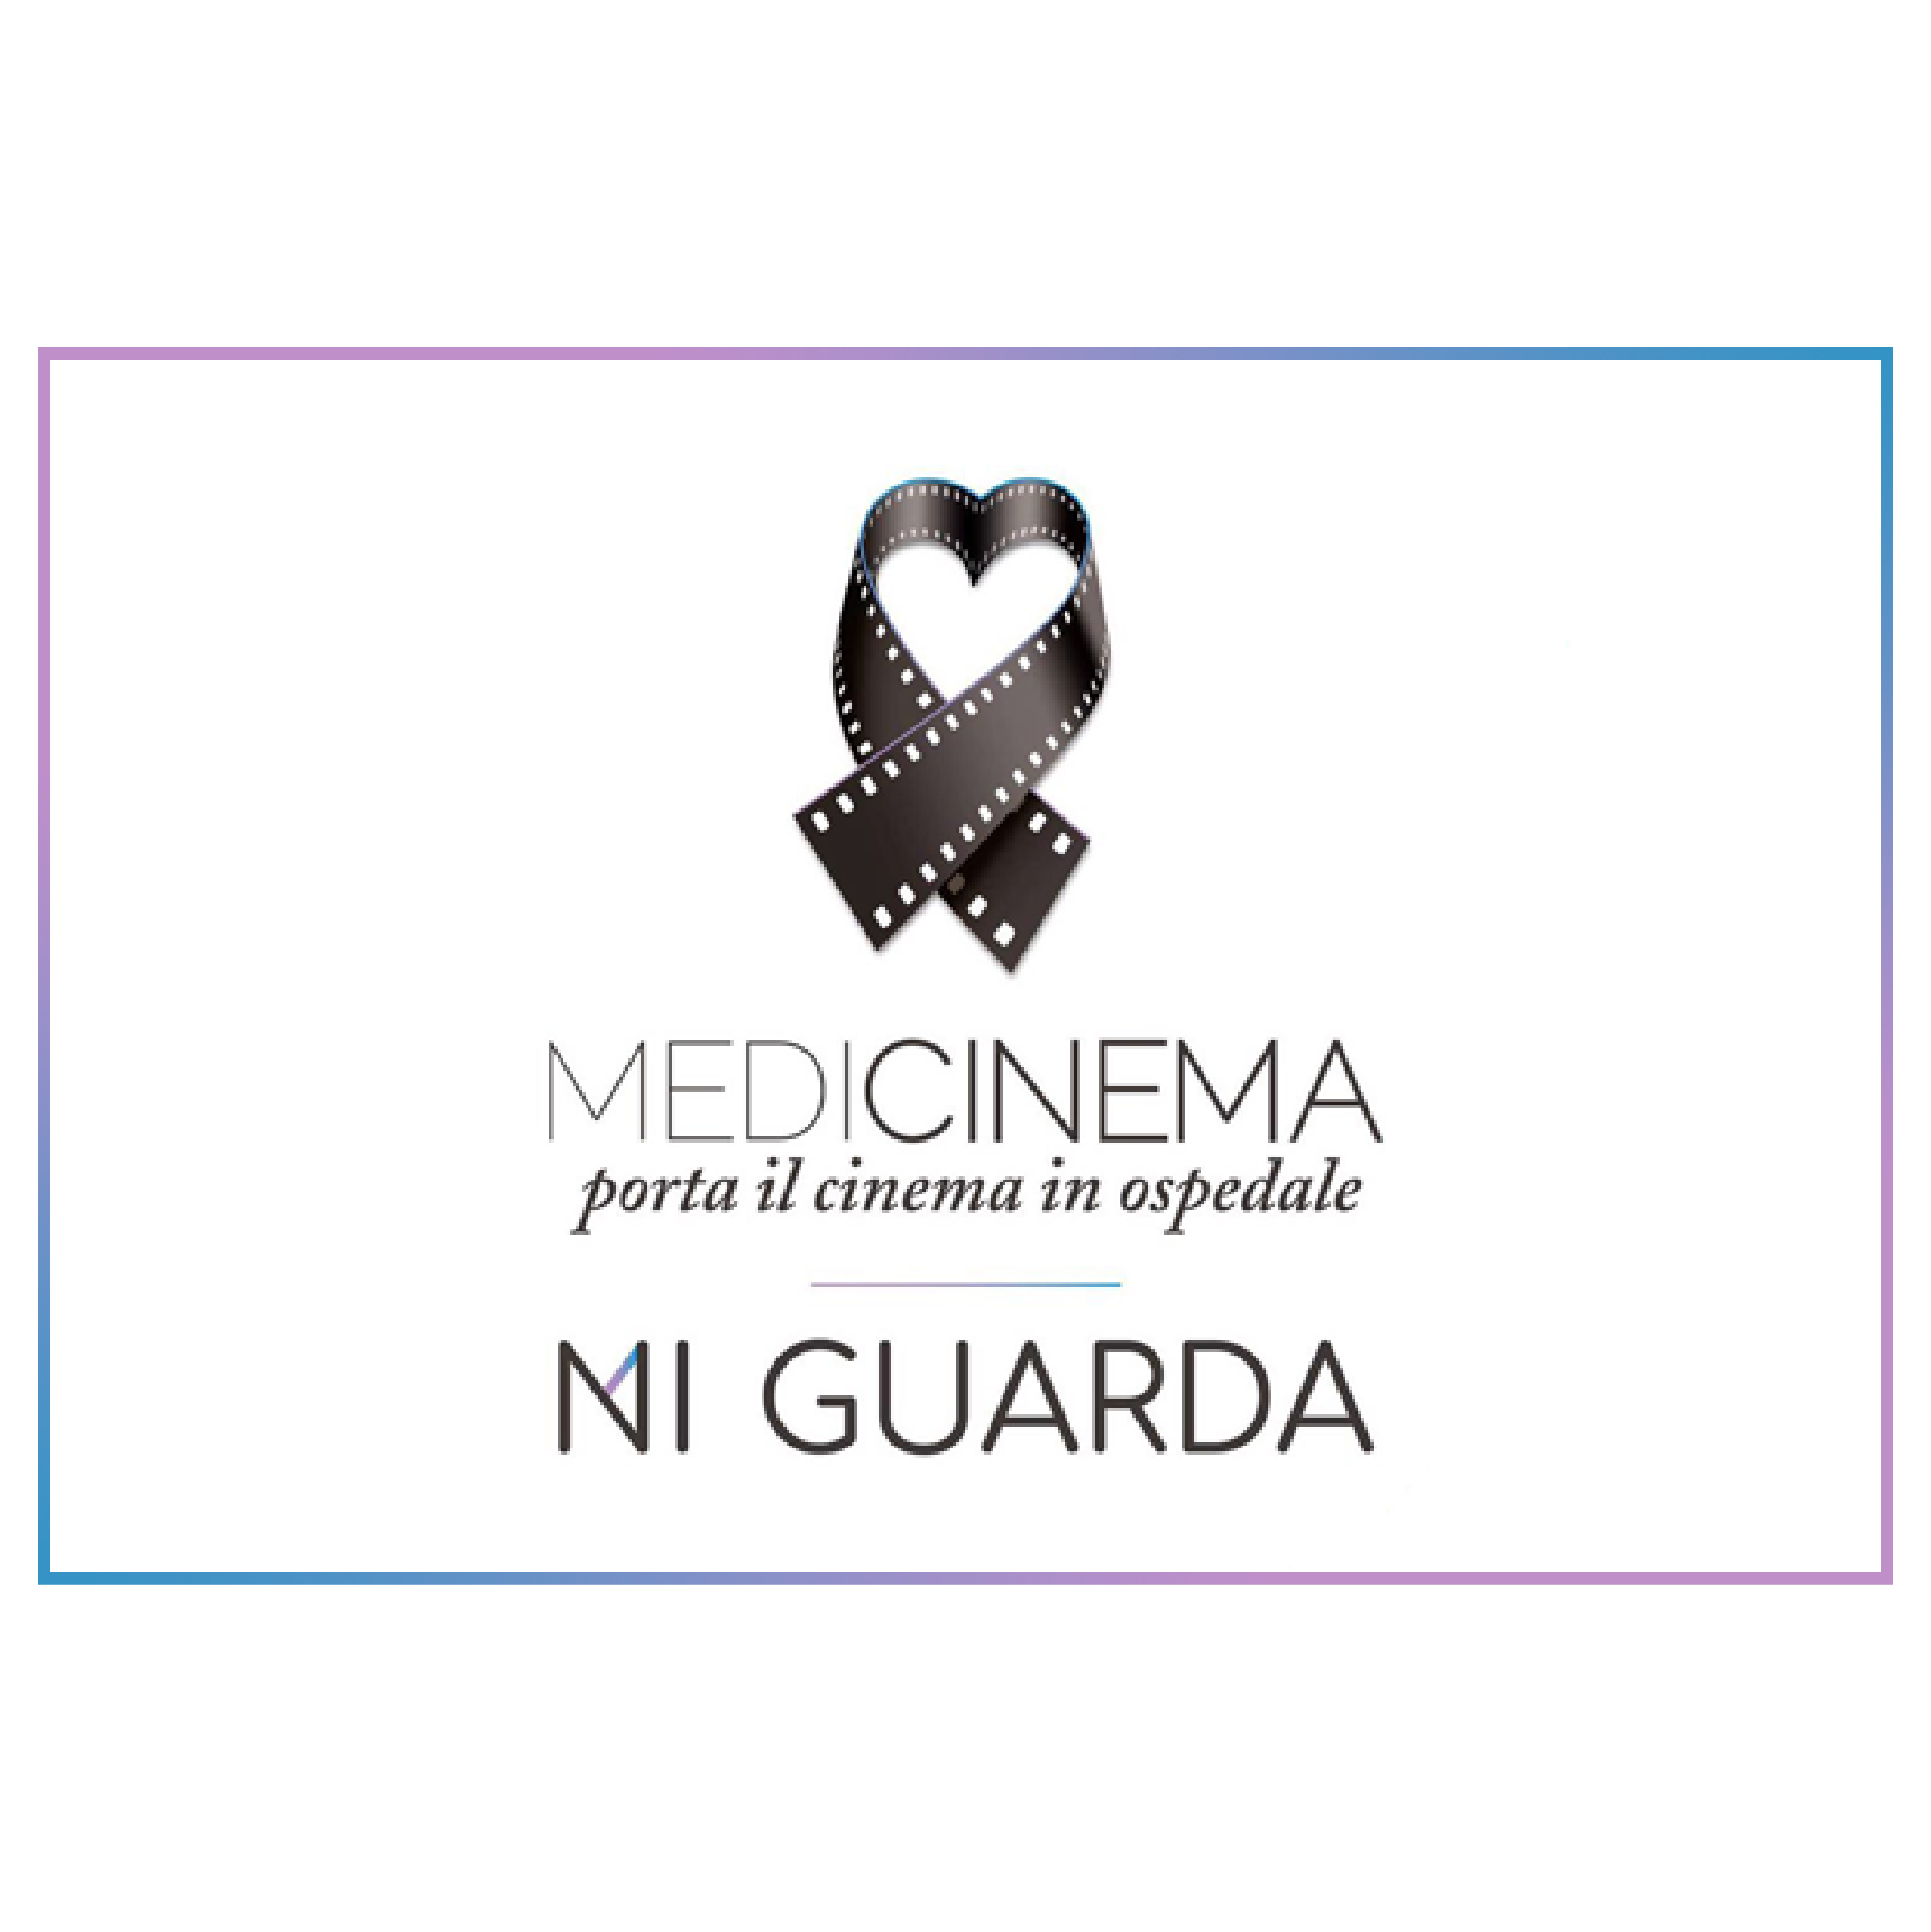 medicinema